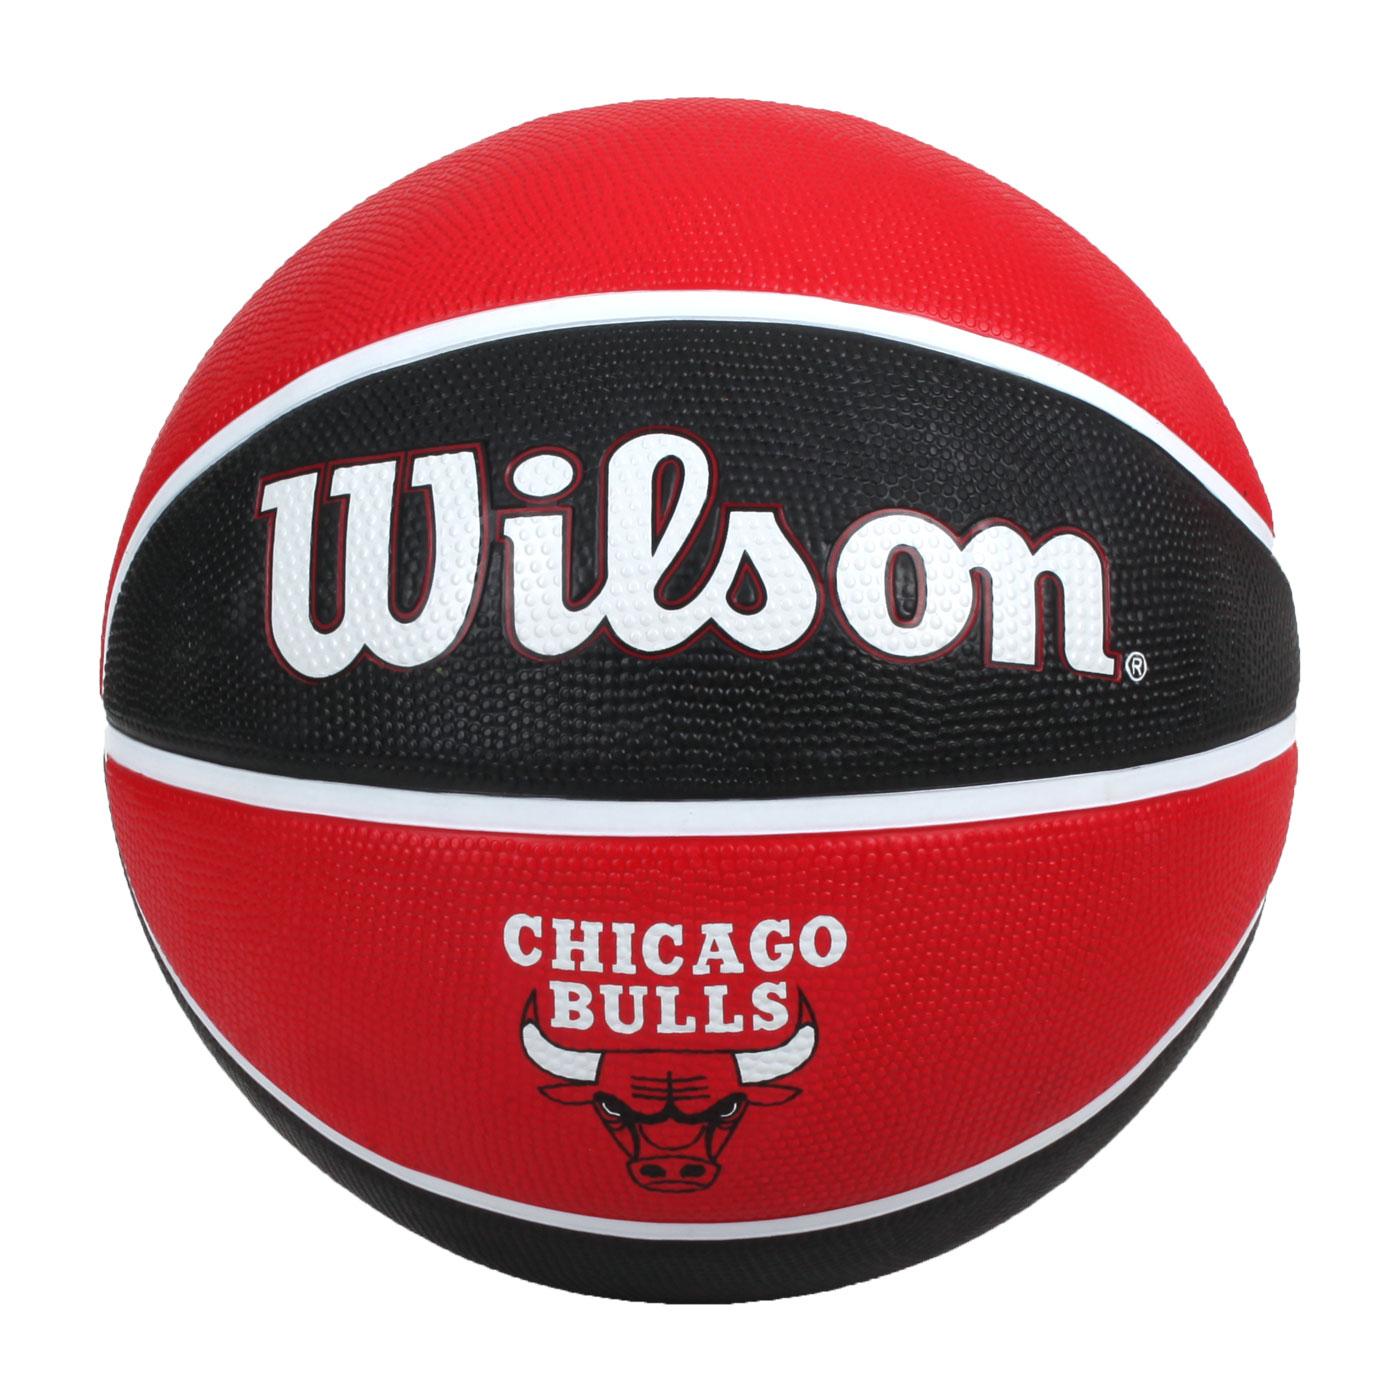 WILSON NBA隊徽系列21' 公牛隊橡膠籃球#7 WTB1300XBCHI - 紅黑白